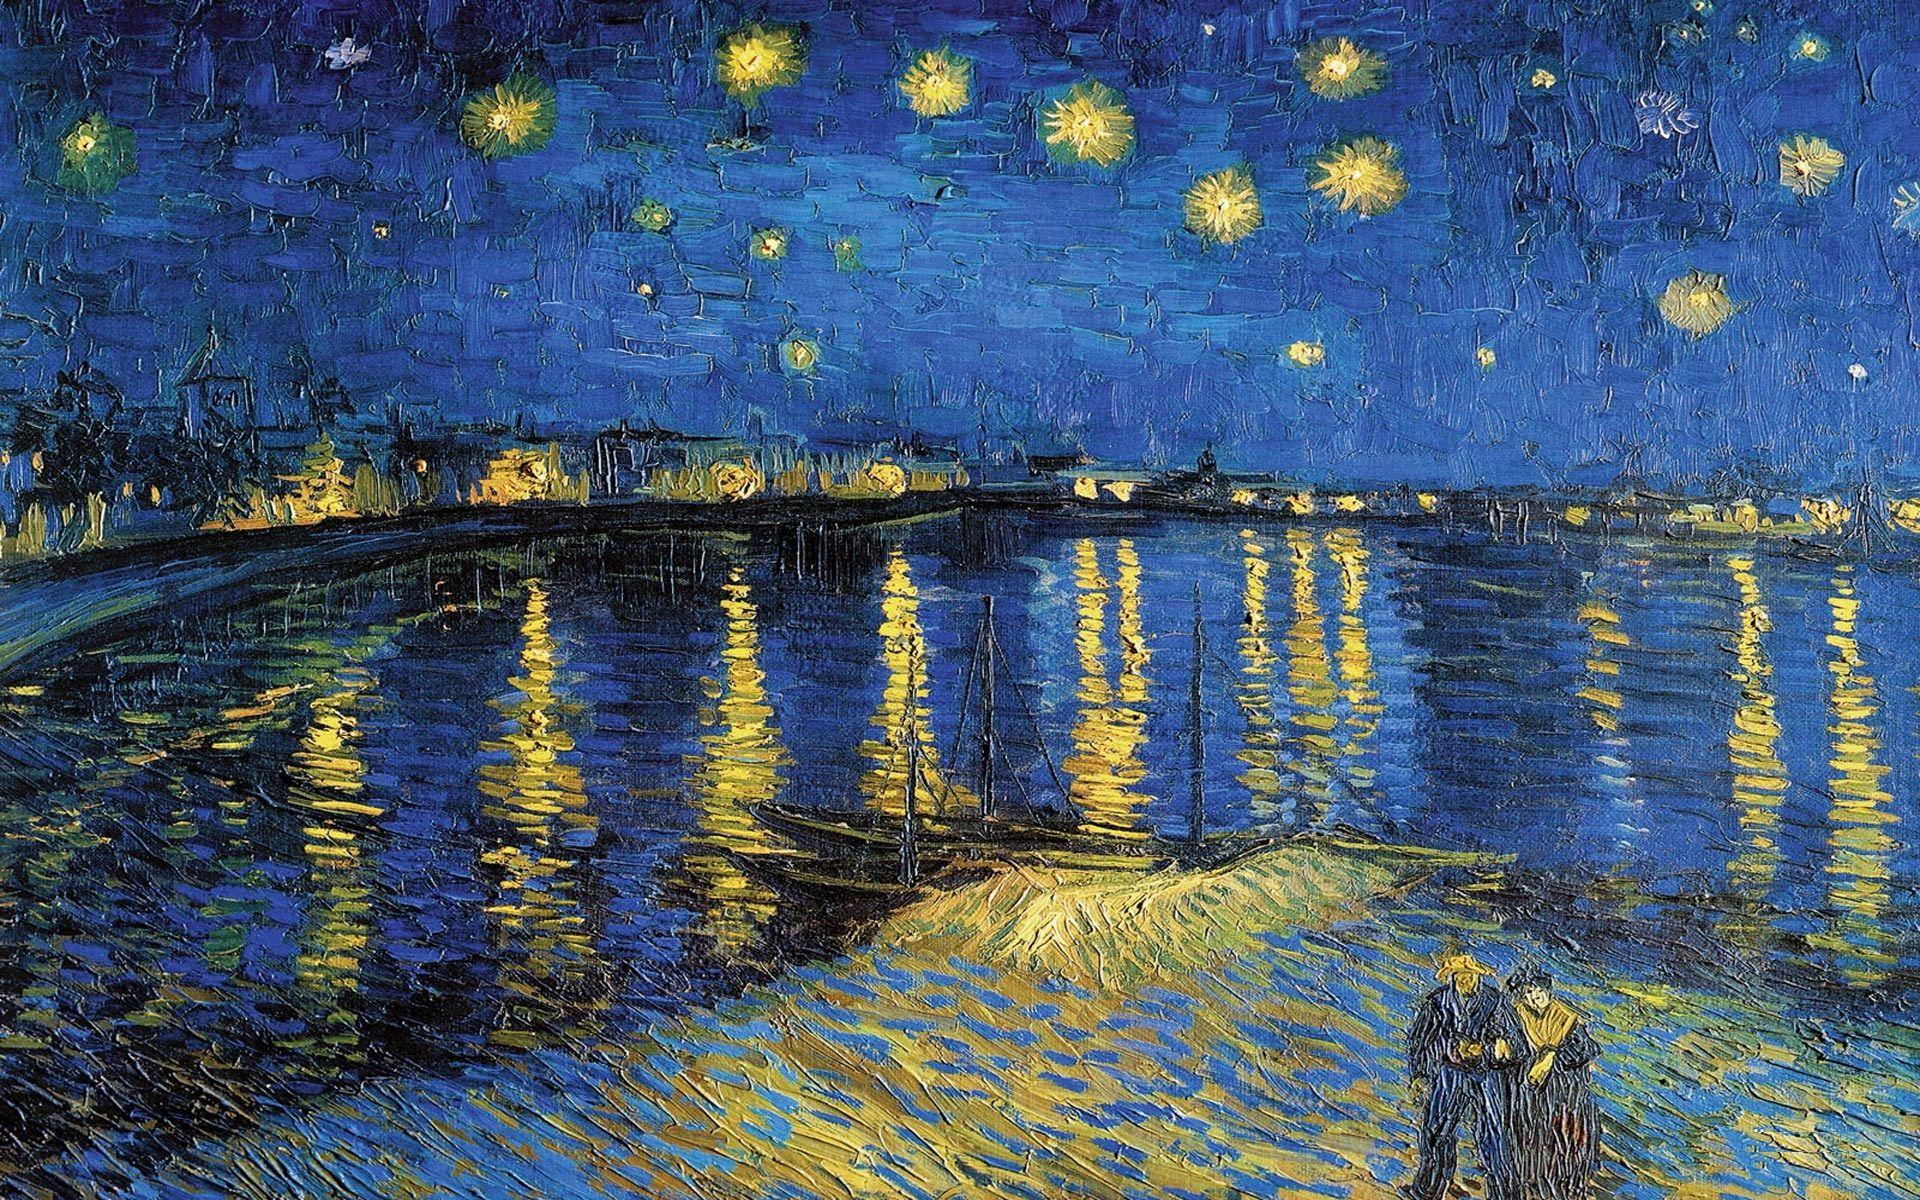 starry-night-nature-hd-wallpaper.jpeg (1920×1200)